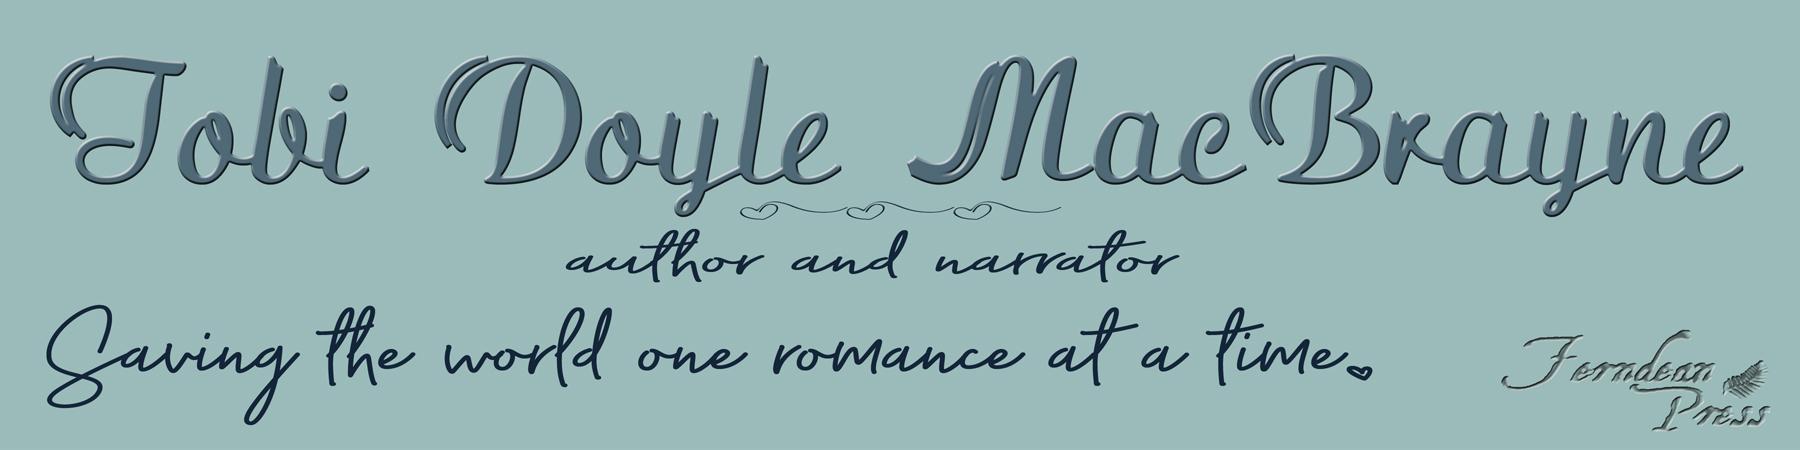 Tobi Doyle MacBrayne